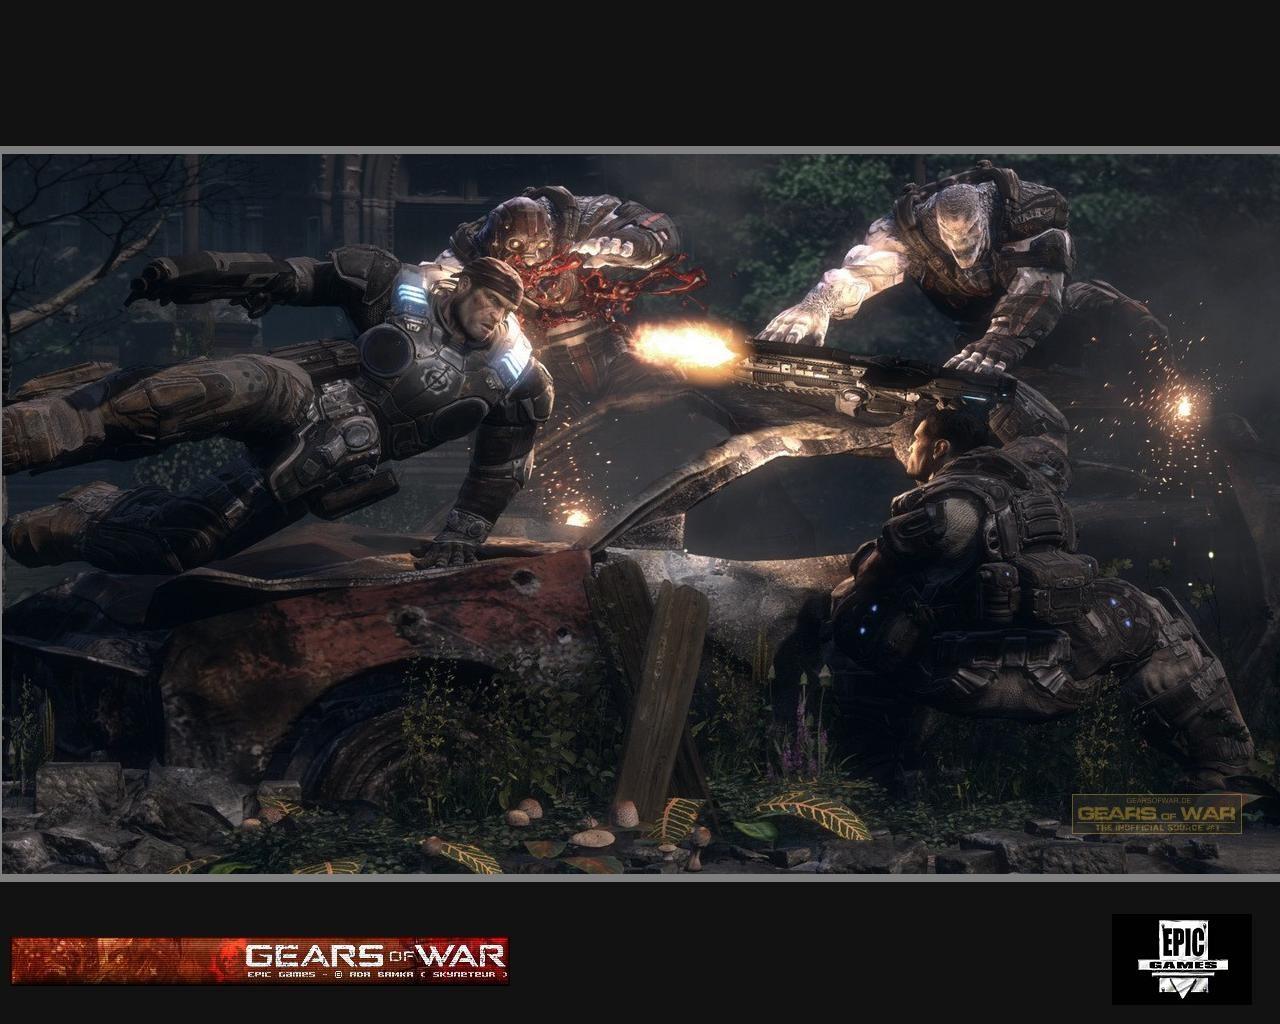 your gamer background wallpapers gears war epic games wallpaperjpg 1280x1024